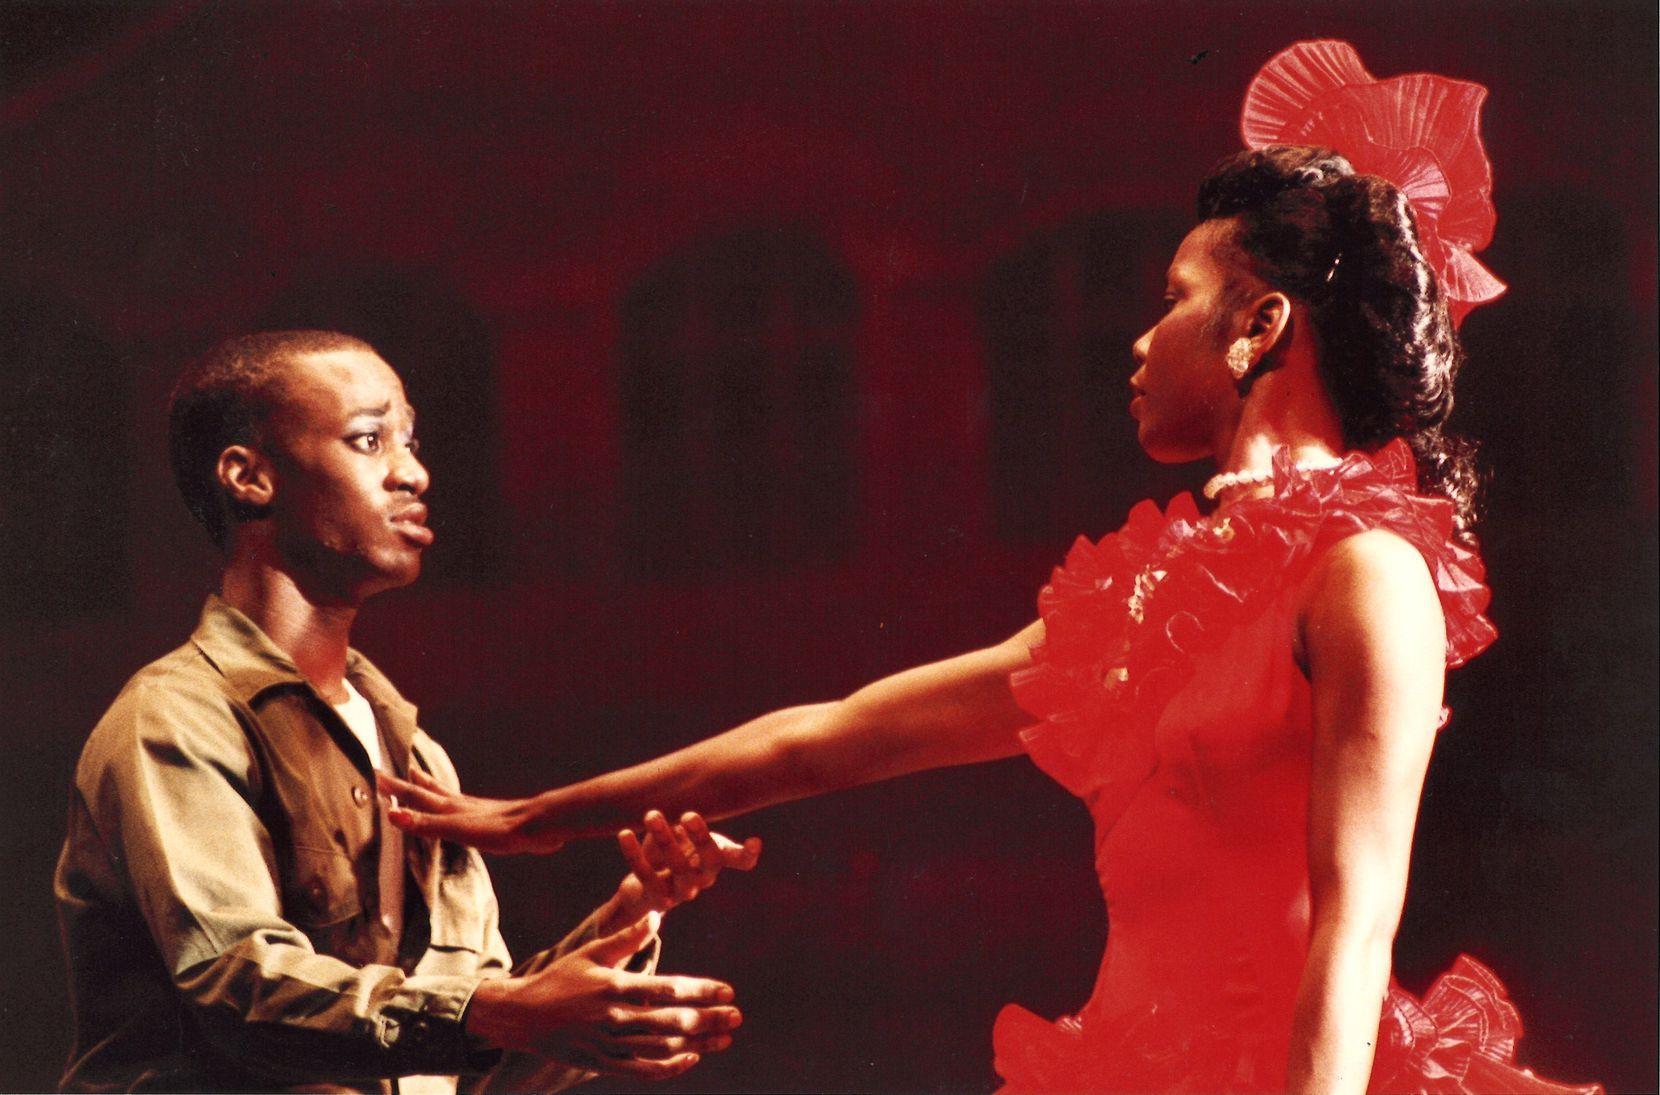 Patricia Price is Carmen and Derrick Brown is Joe in the Dallas Black Dance Theatre's version of Carmen Jones in 1984.